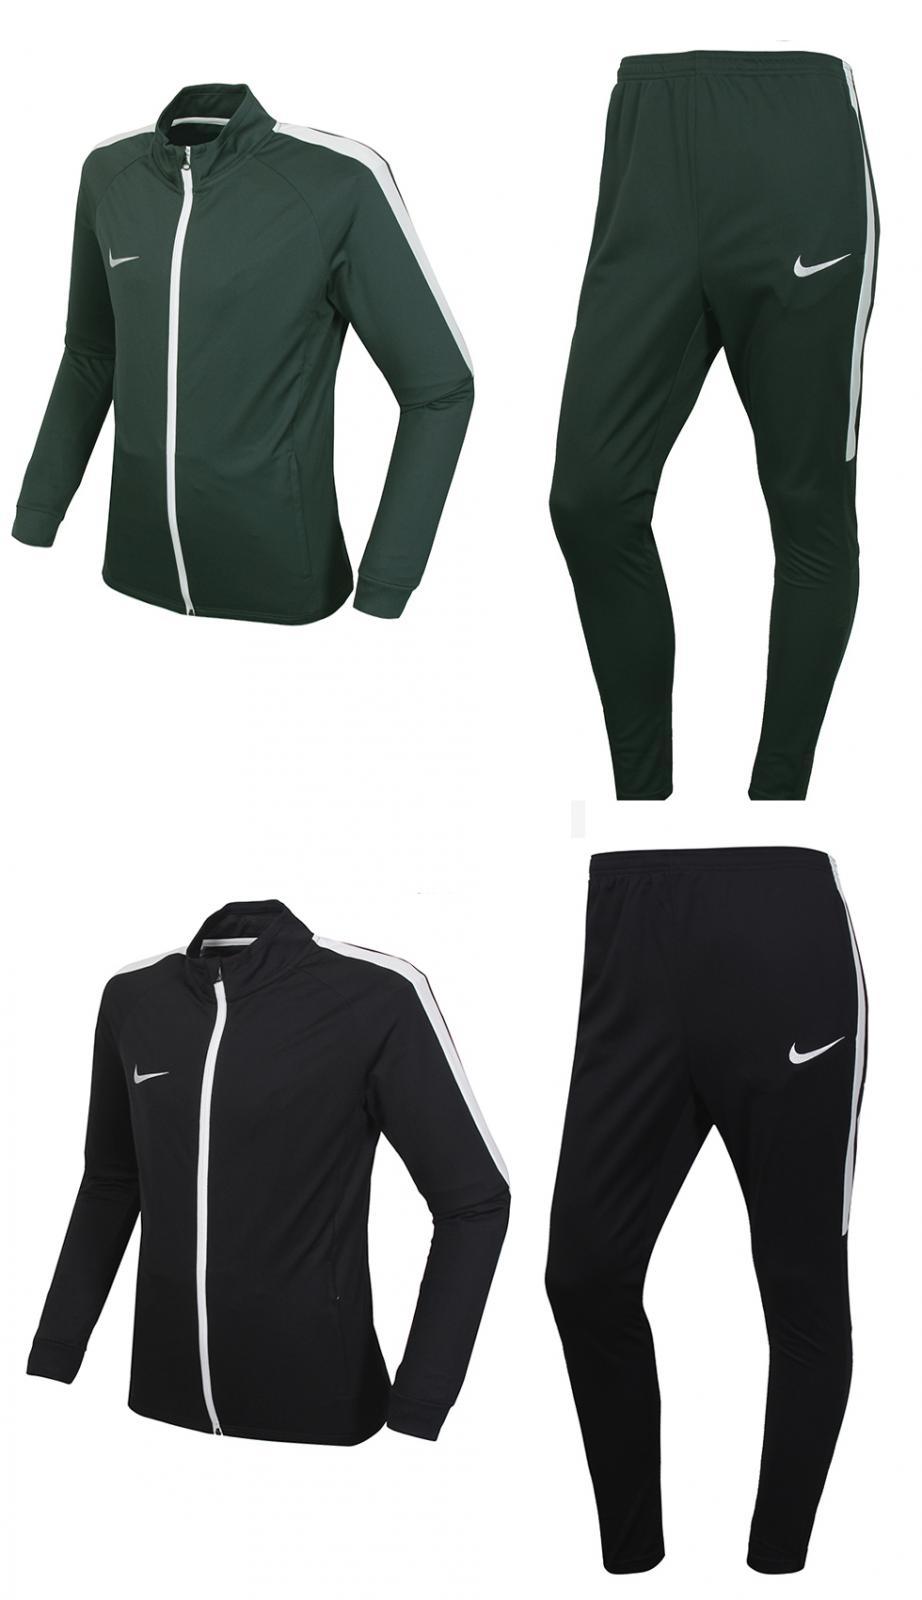 Nike jacket academy - Size Reference Chart